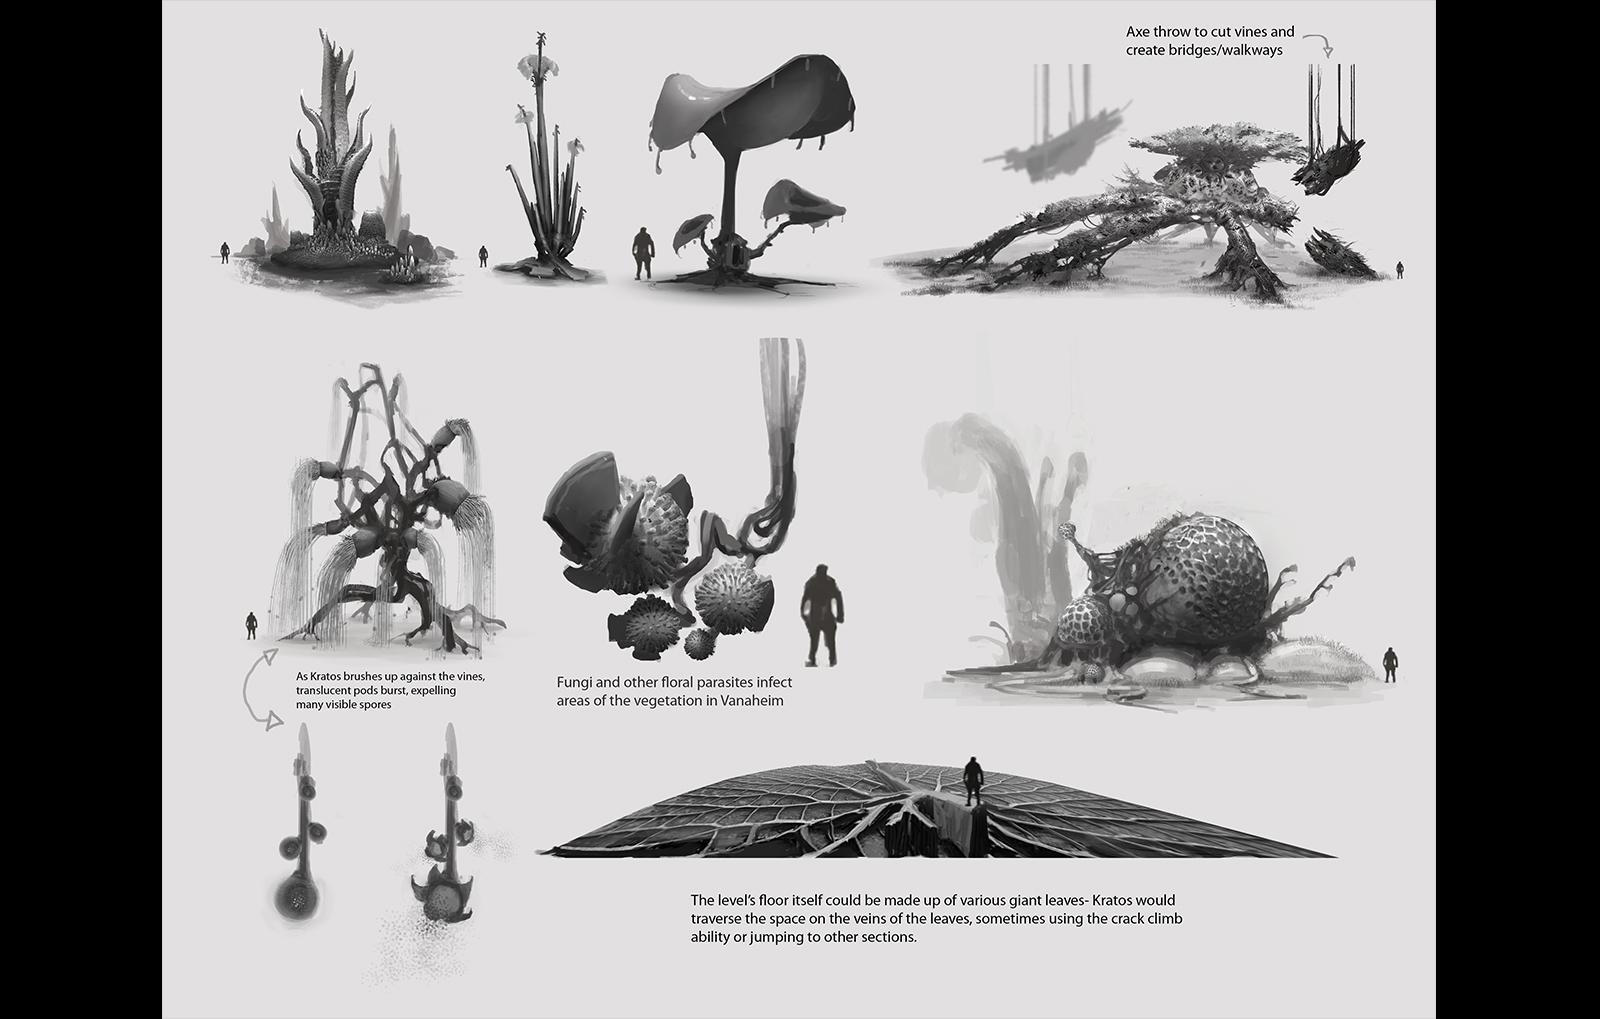 Concept Art Leaks Suggest 'God of War 4' is Based on Norse Mythology